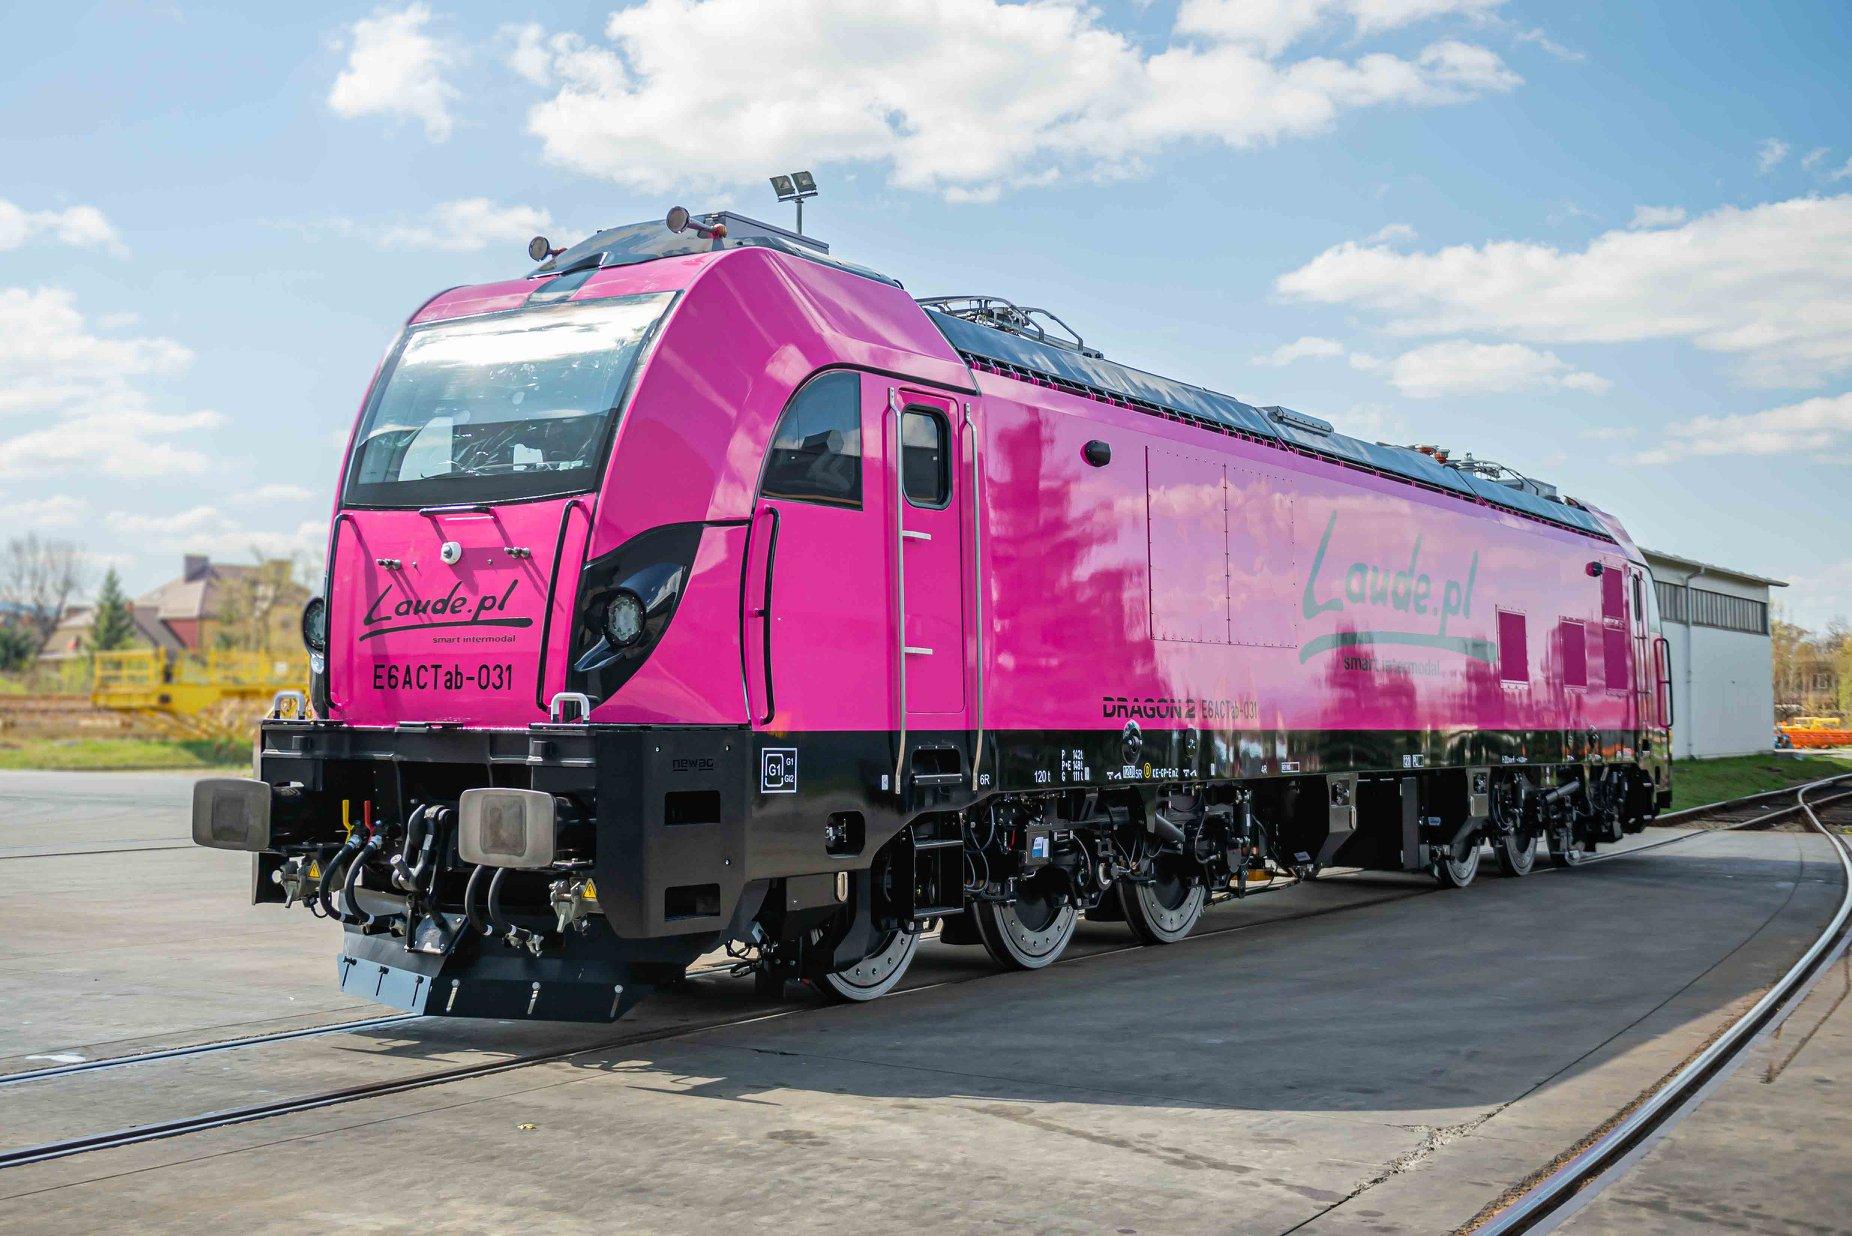 Newag Dragon 2 locomotive for Laude Smart Intermodal